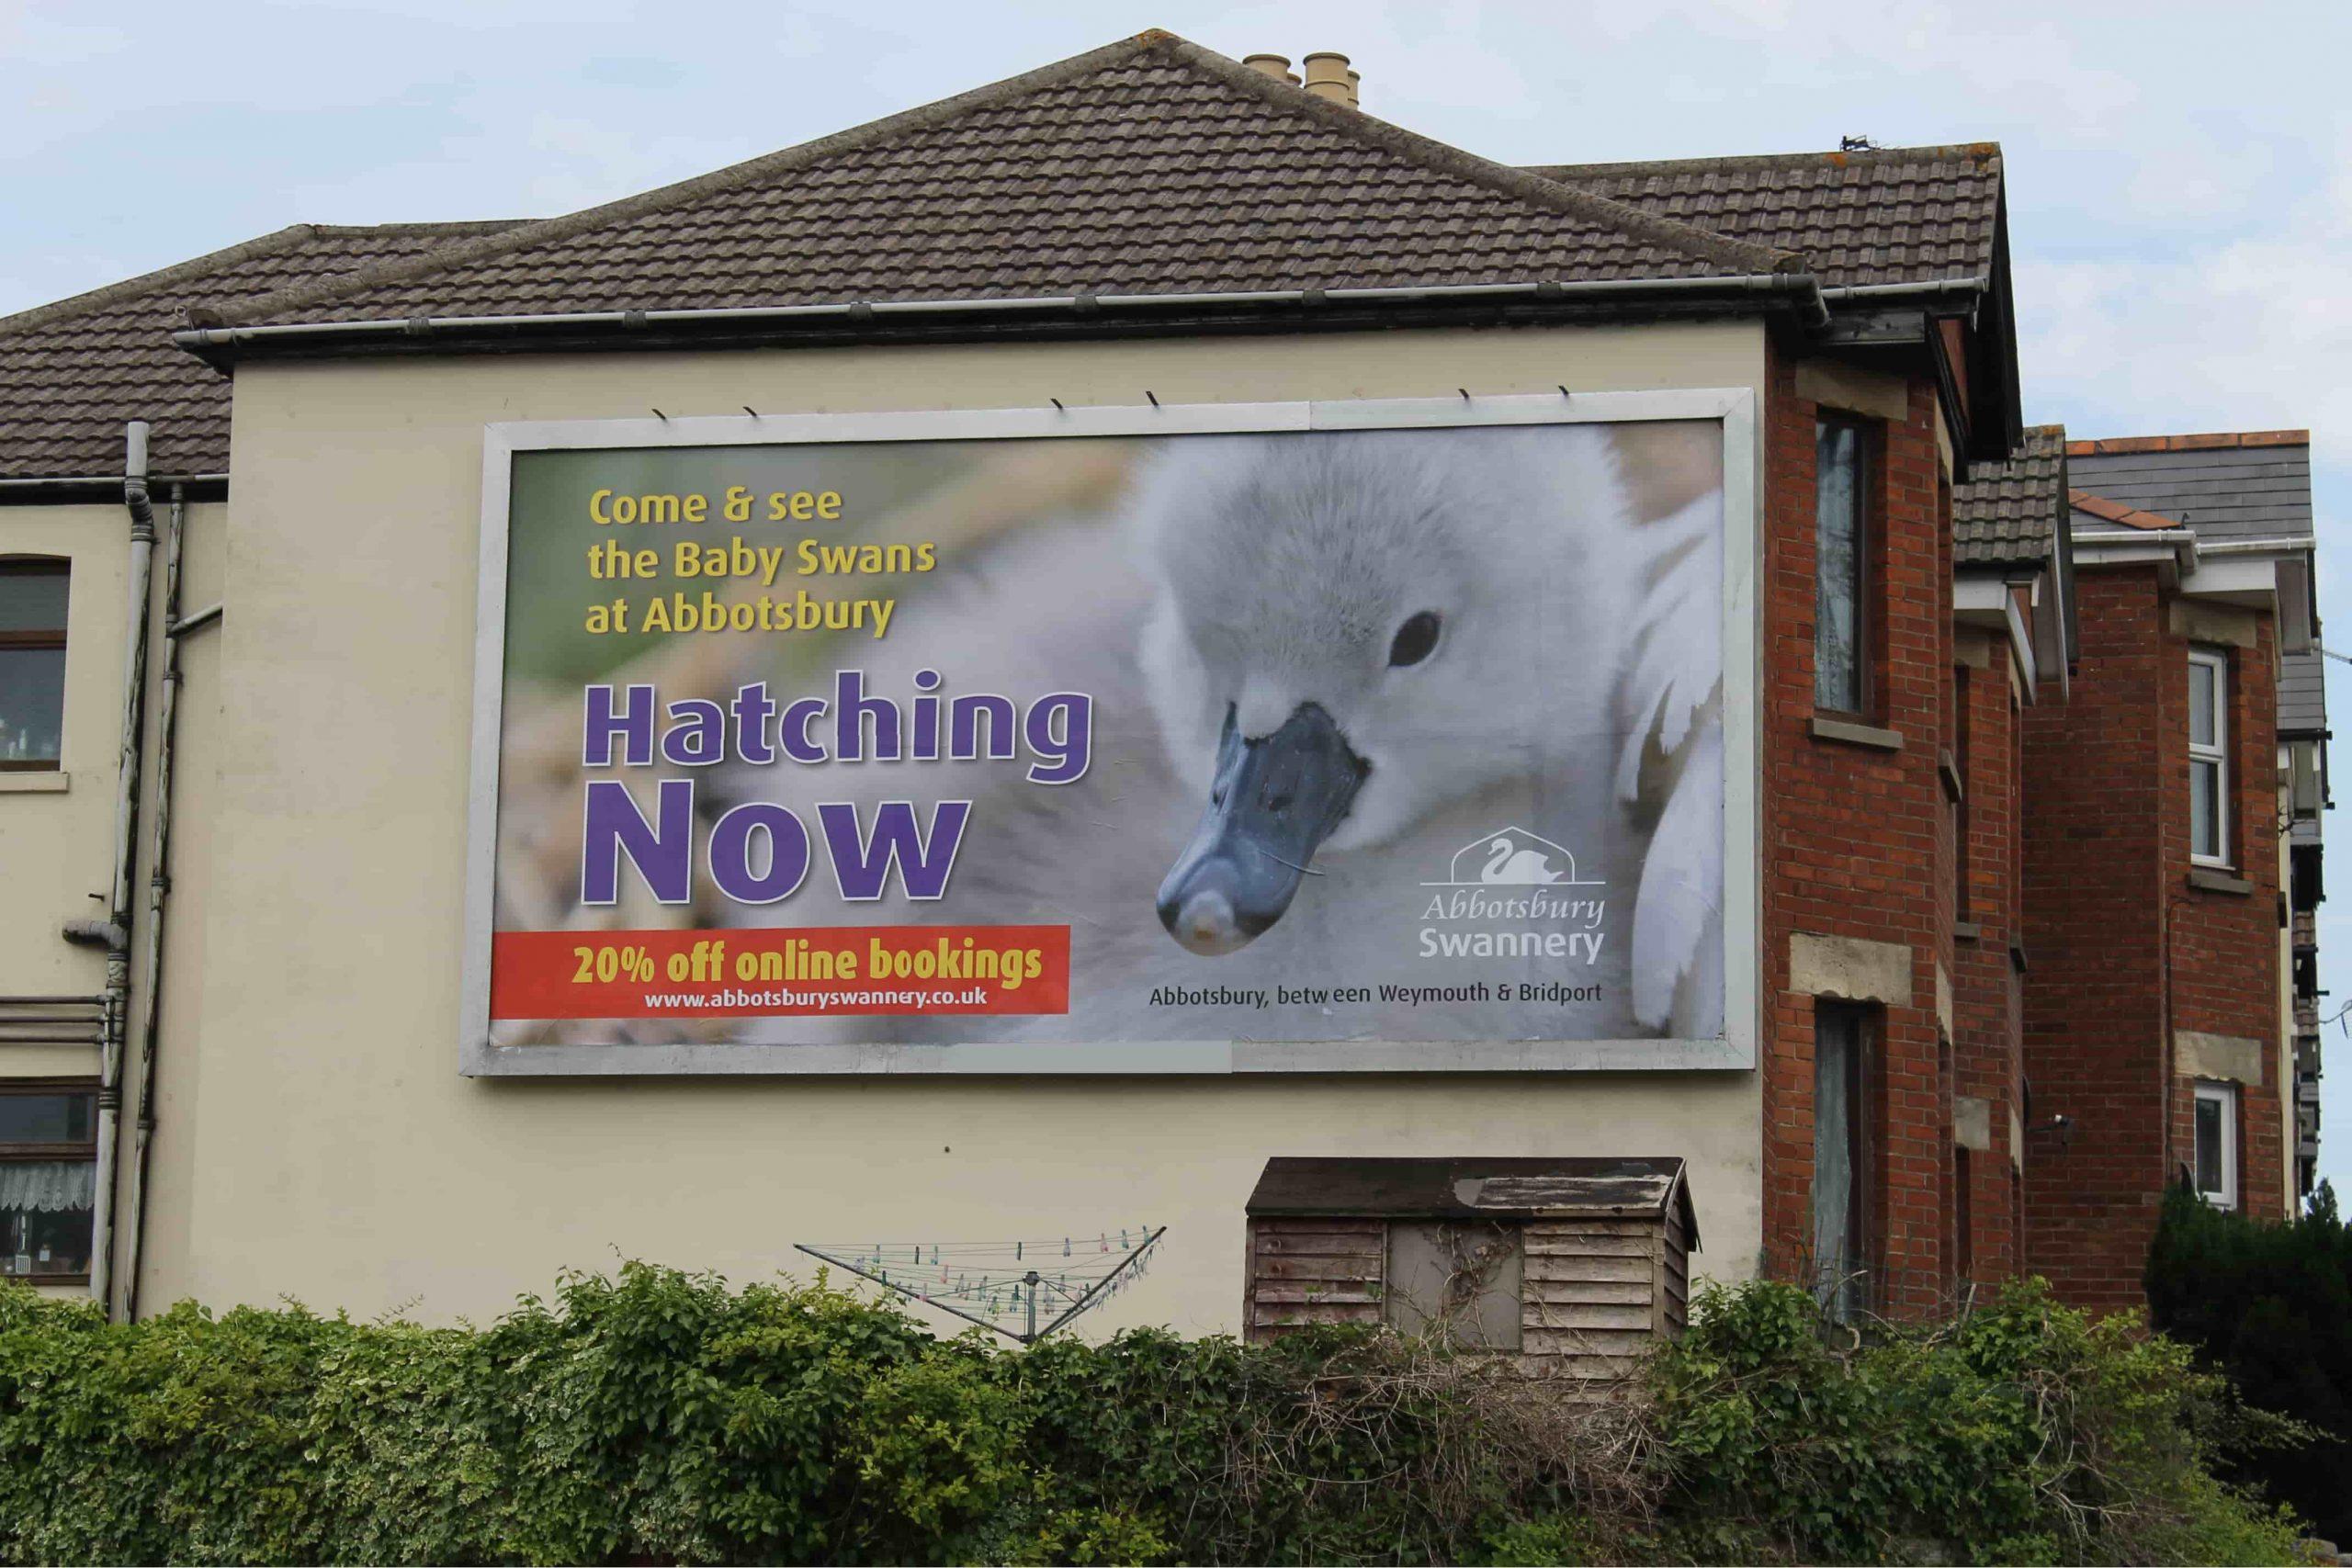 Creating an effective billboard advert